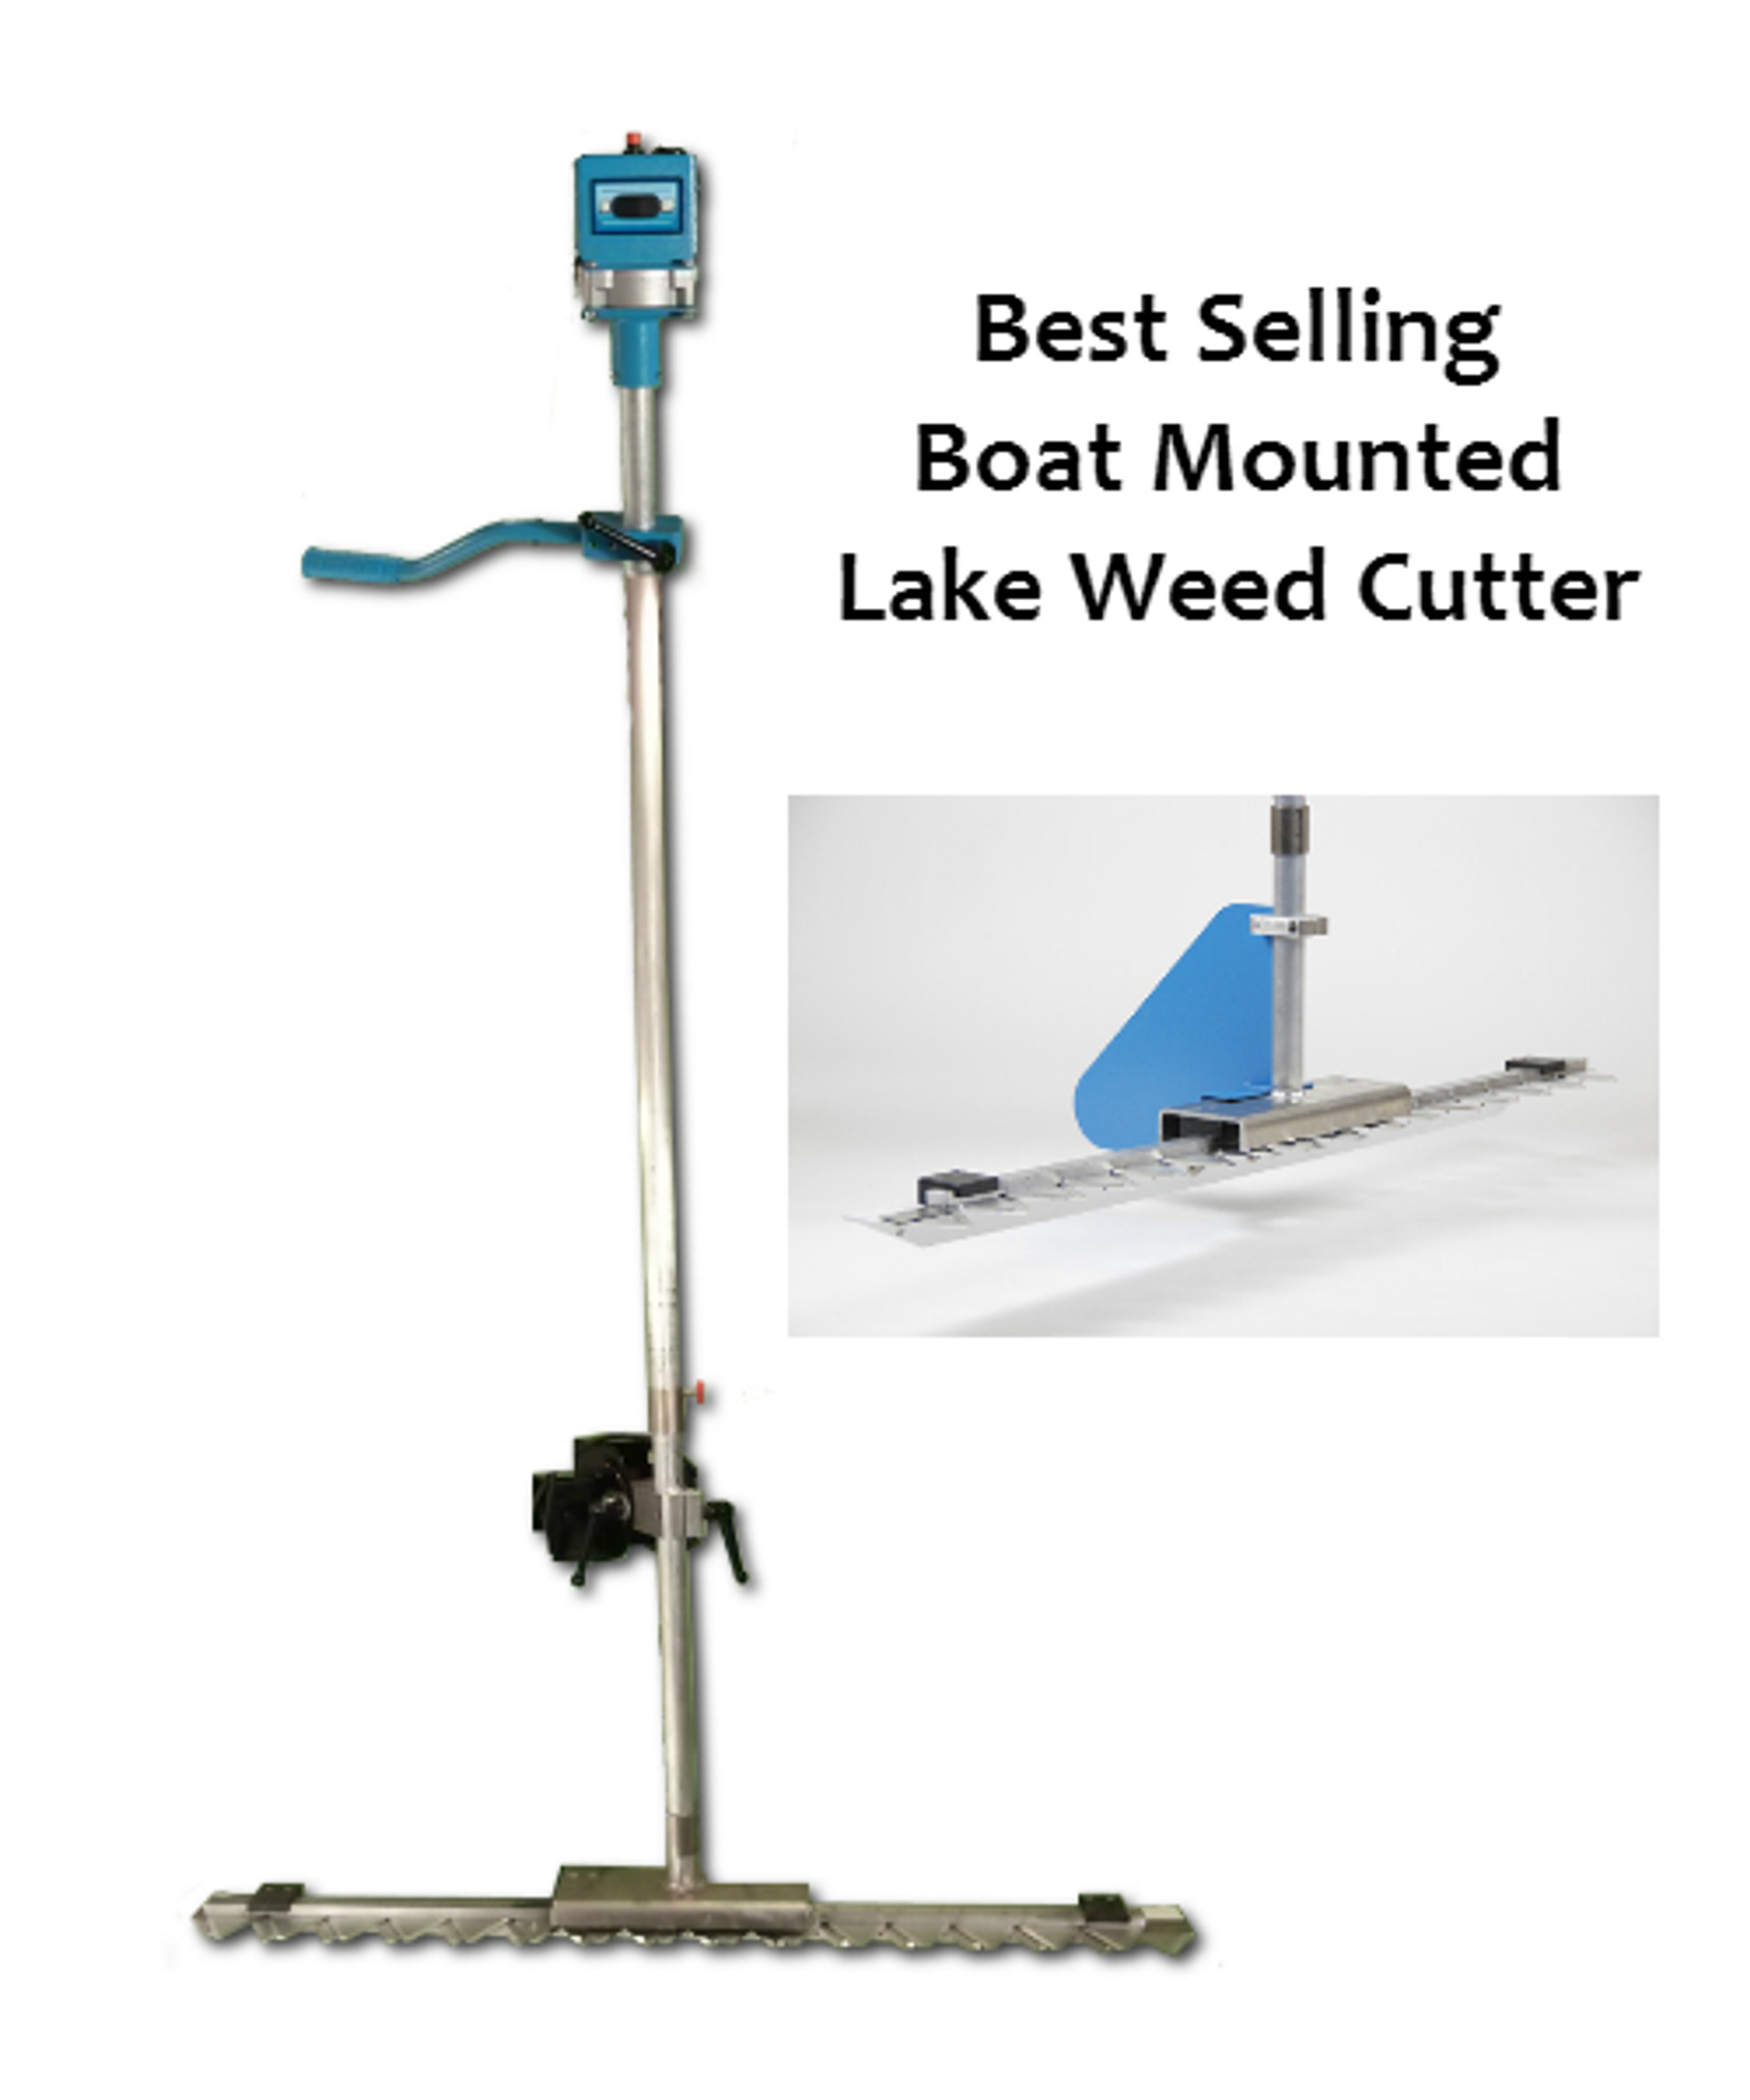 Aquatic Mower Lake Weed Cutter